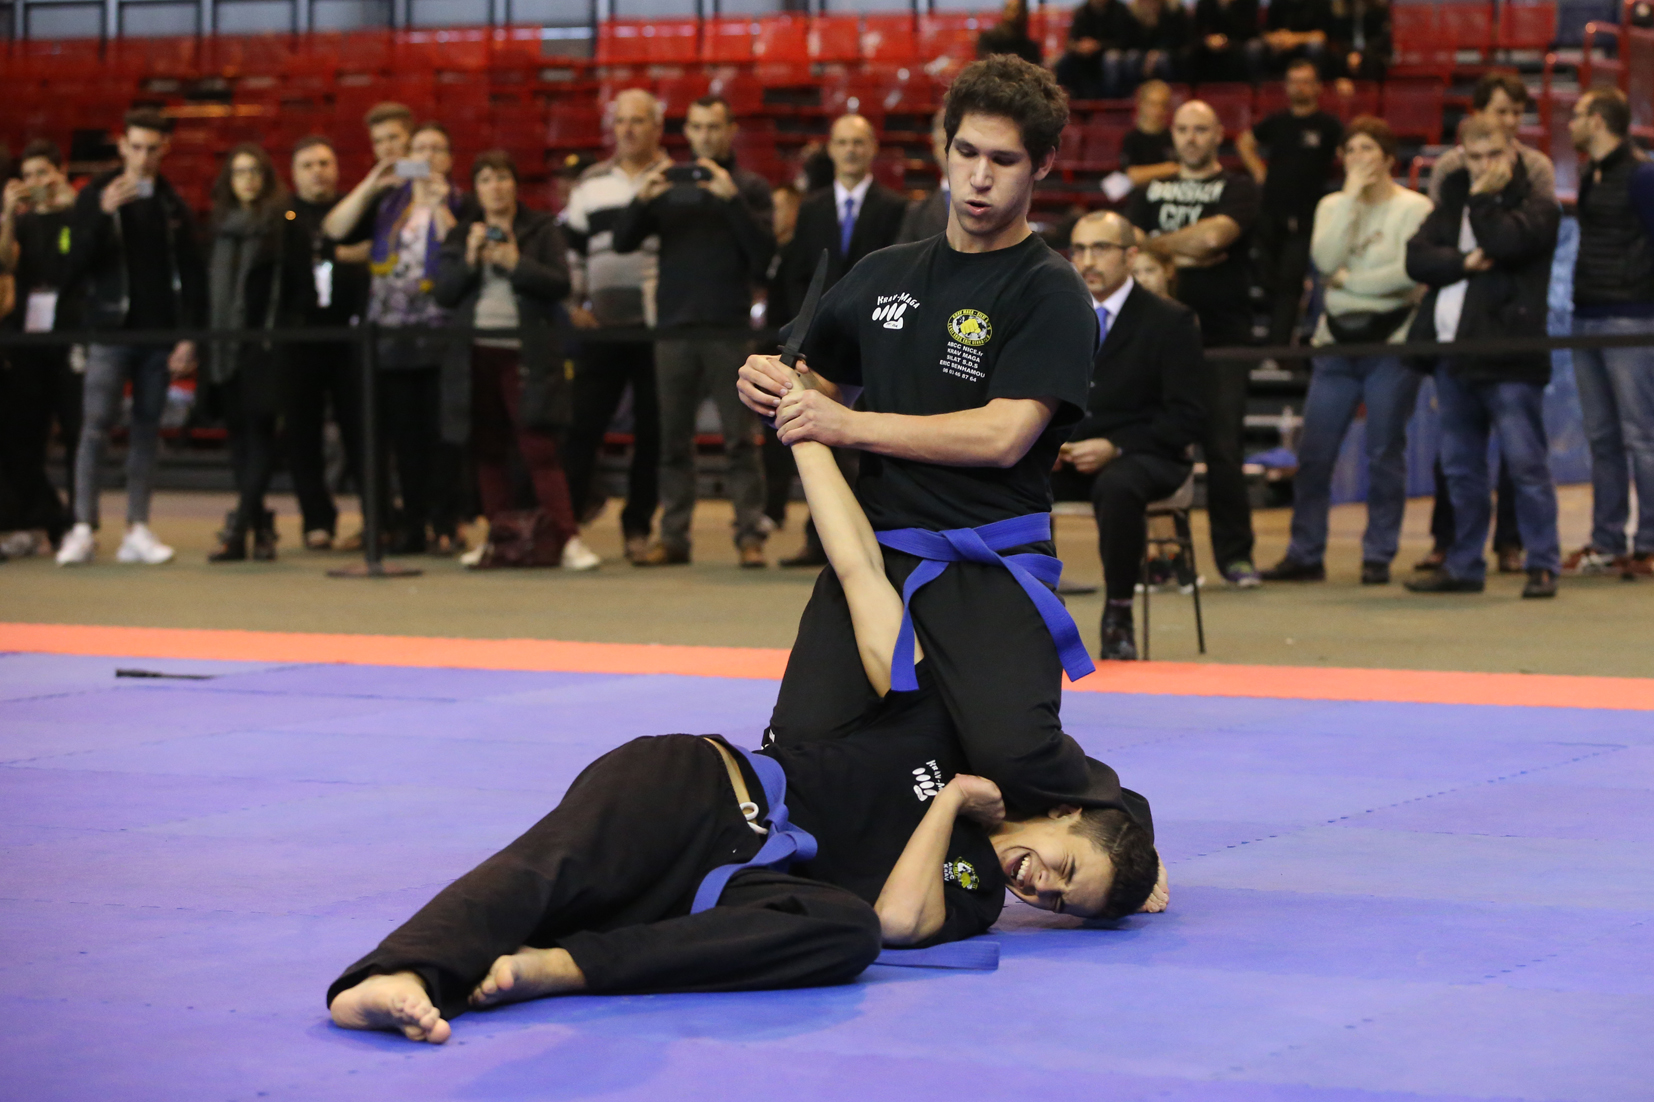 Week end d di krav maga actualit f d ration - Institut national du judo porte de chatillon ...